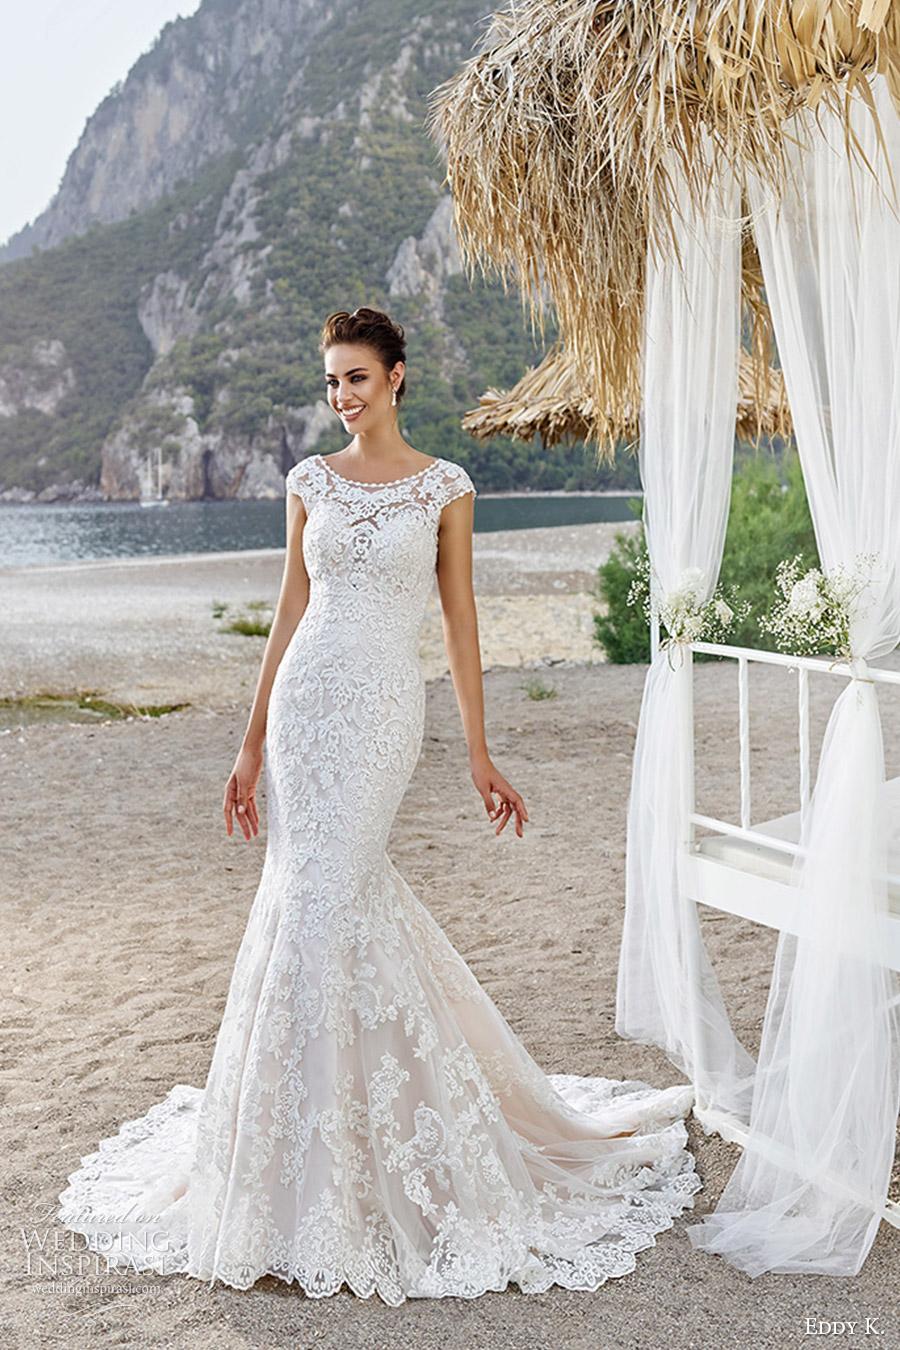 Eddy K 2017 Wedding Dresses Dreams Bridal Collection